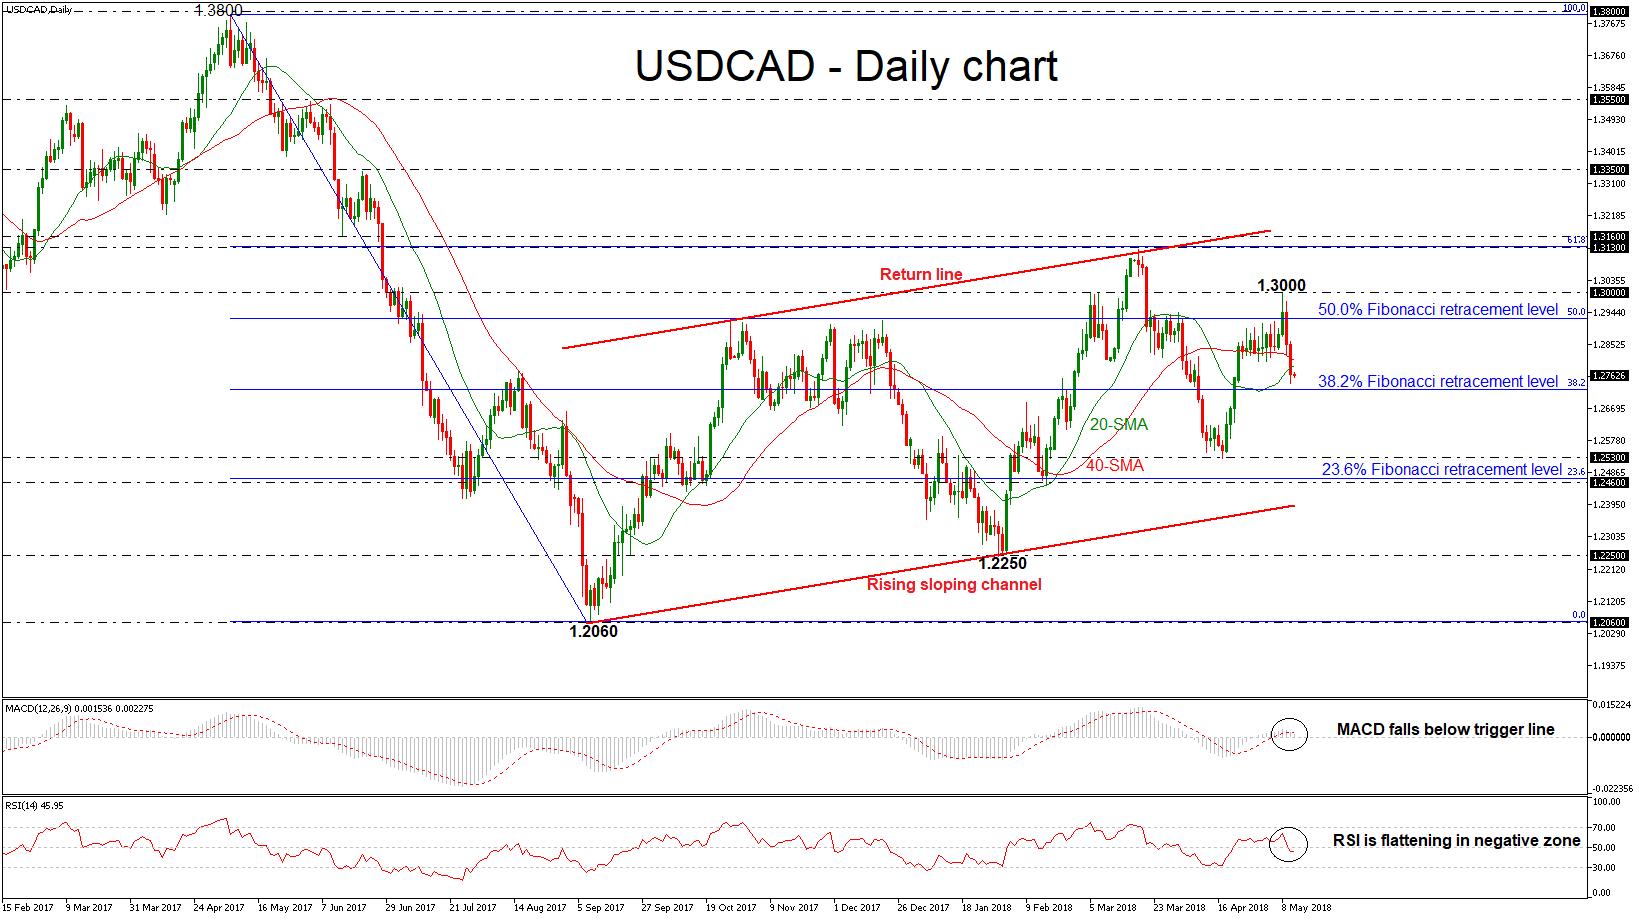 USD/CAD 11 May 2018| EconAlerts